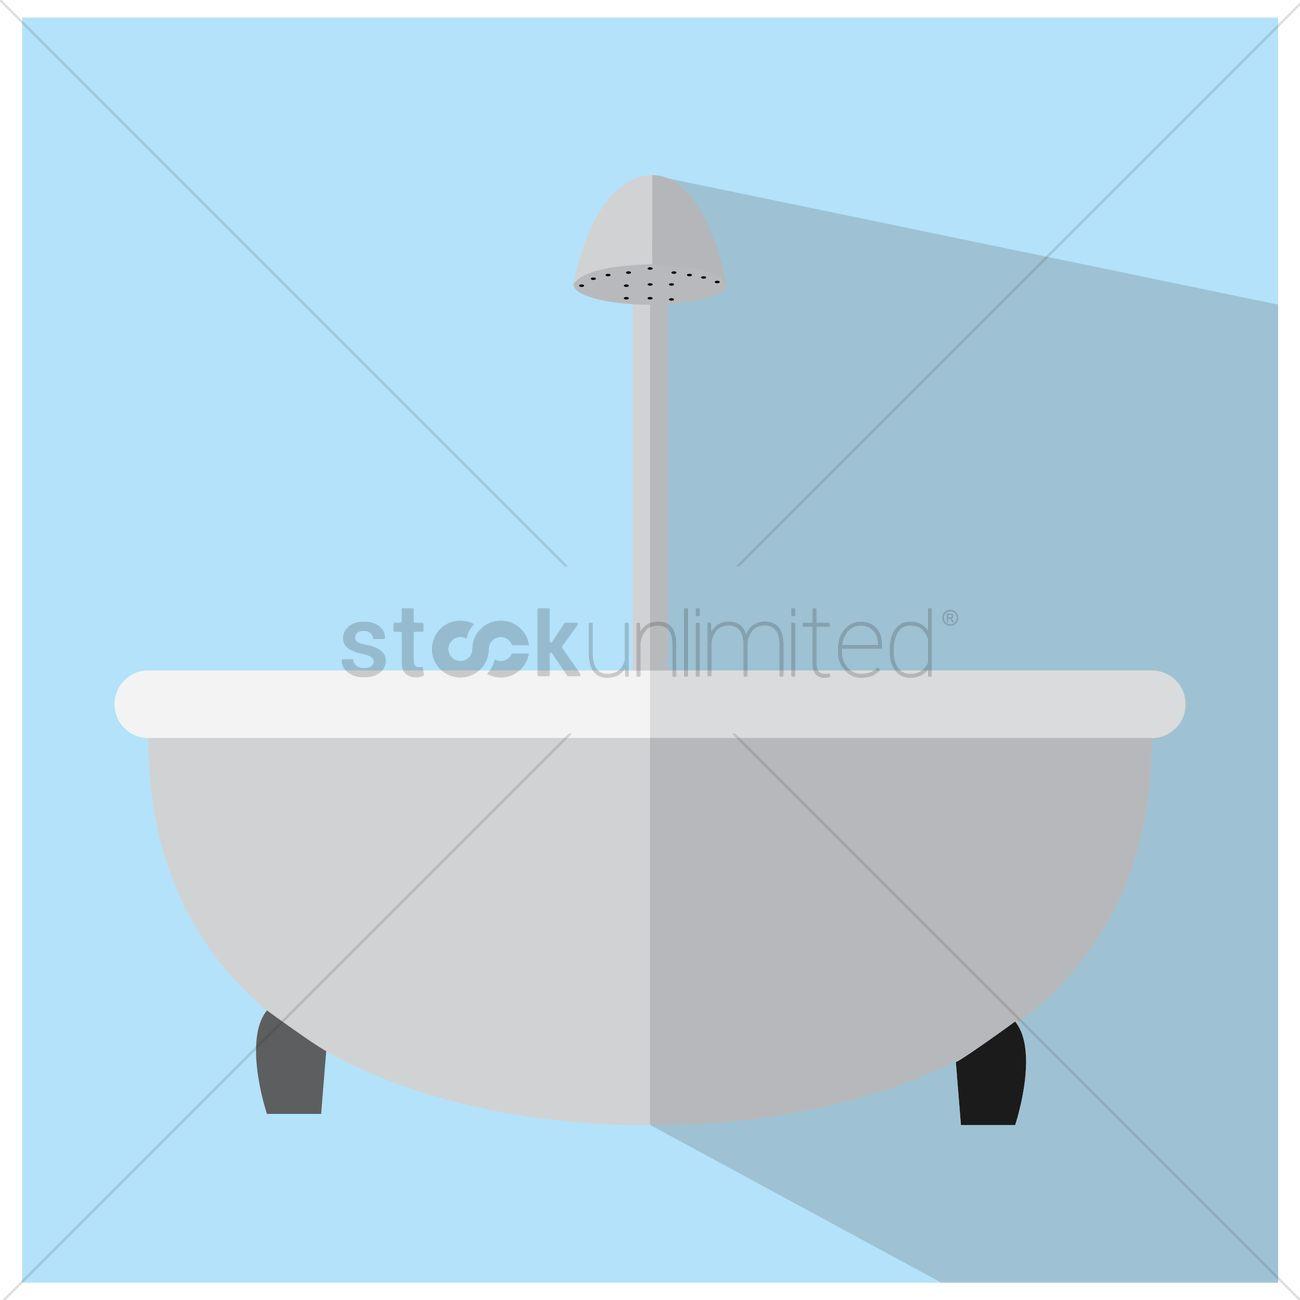 Bathtub Vector Image - 1476019 | StockUnlimited